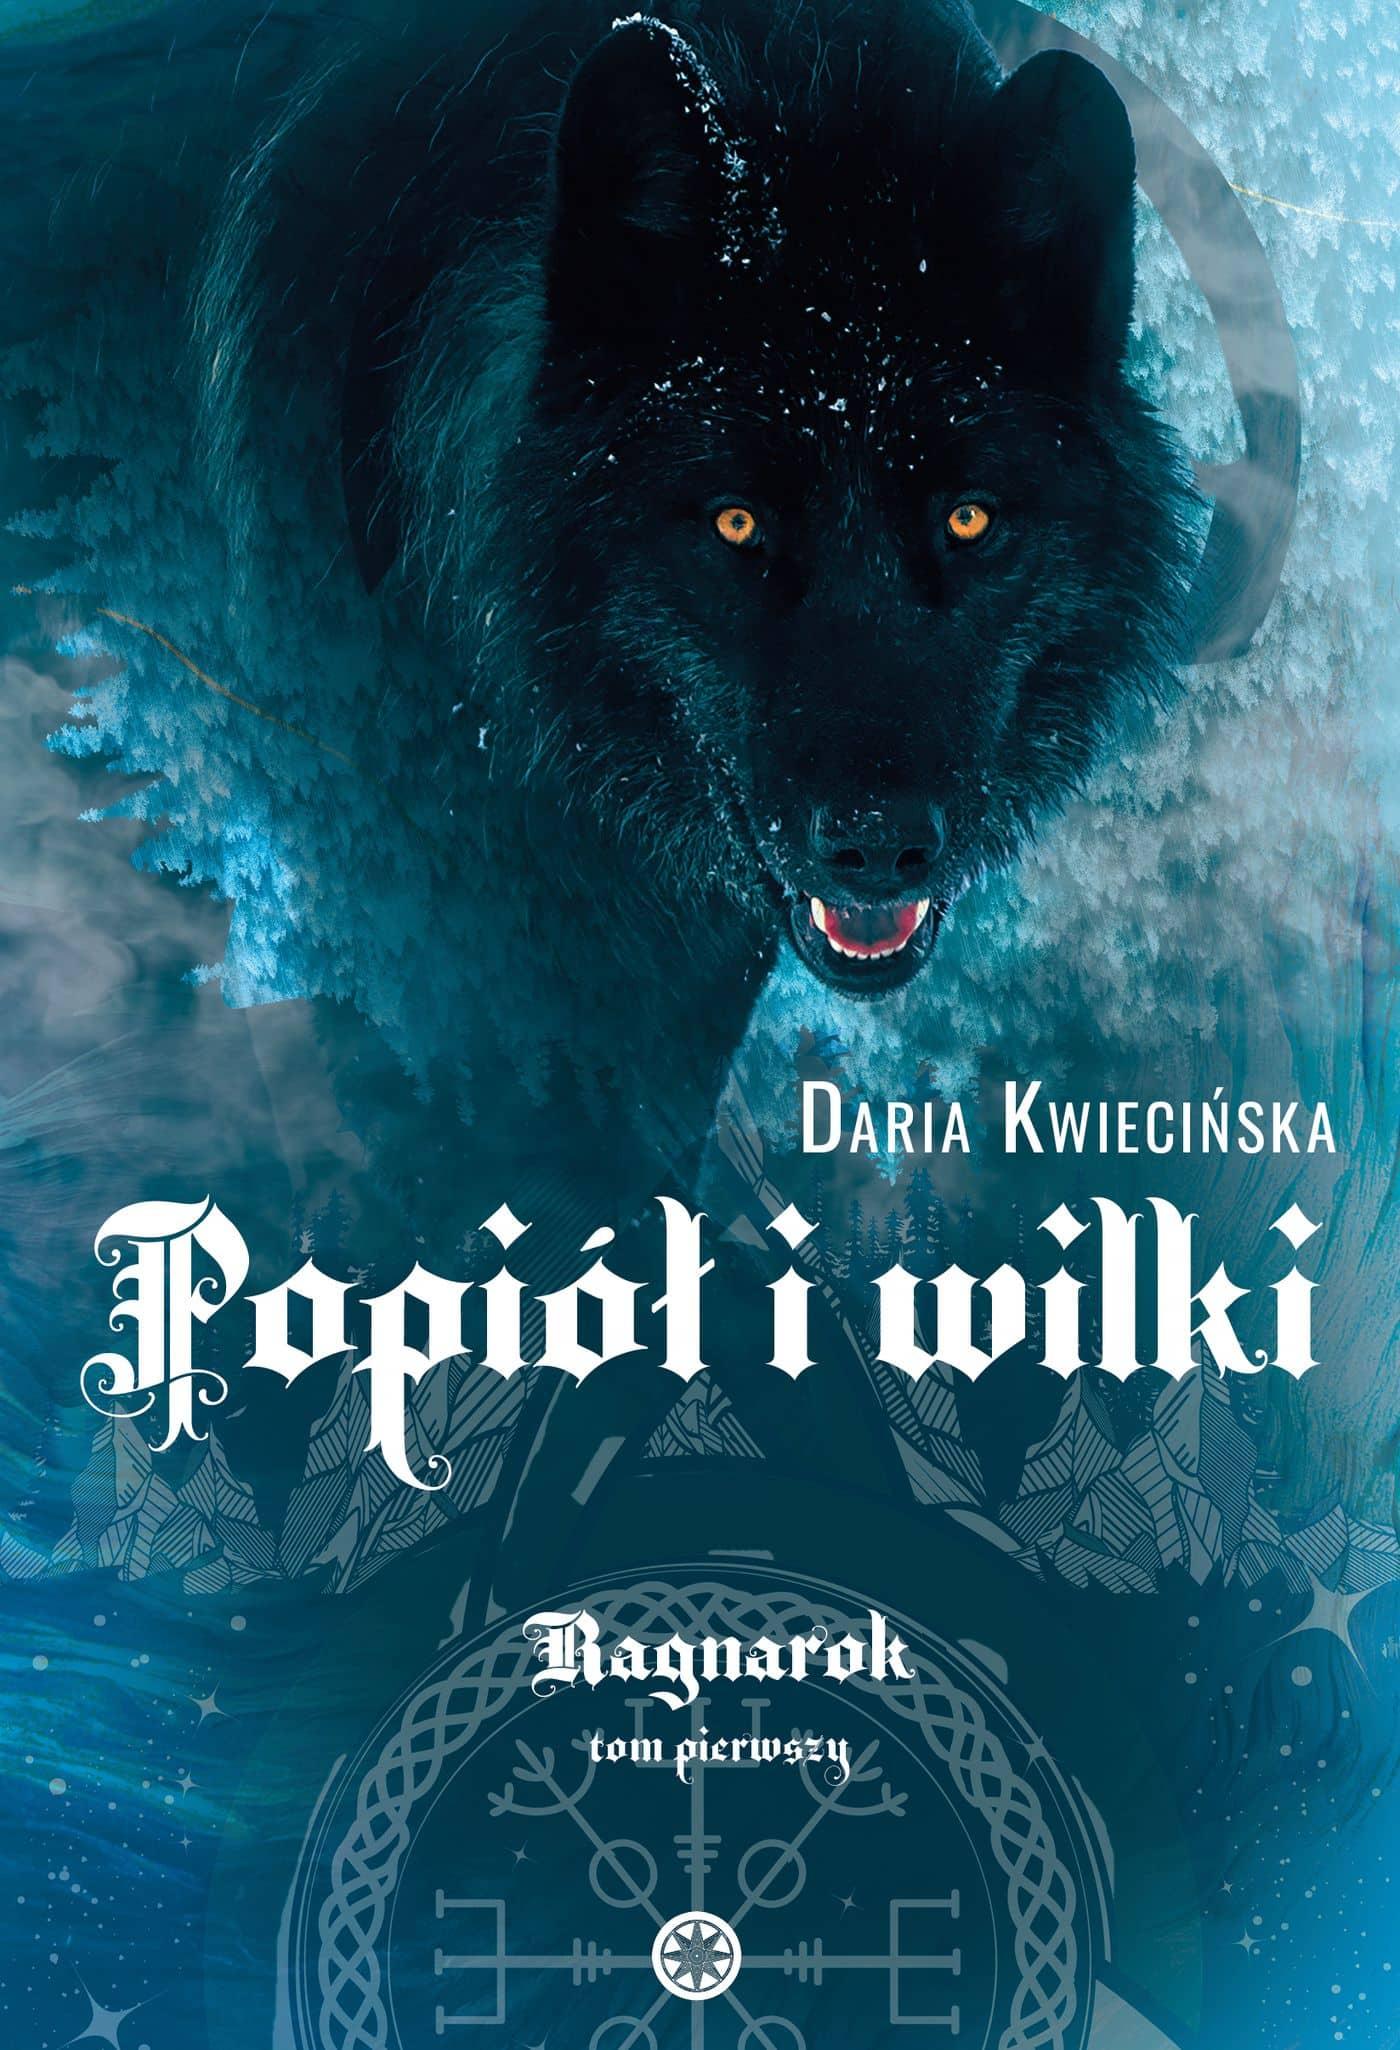 Ragnarok - Popiół i wilki